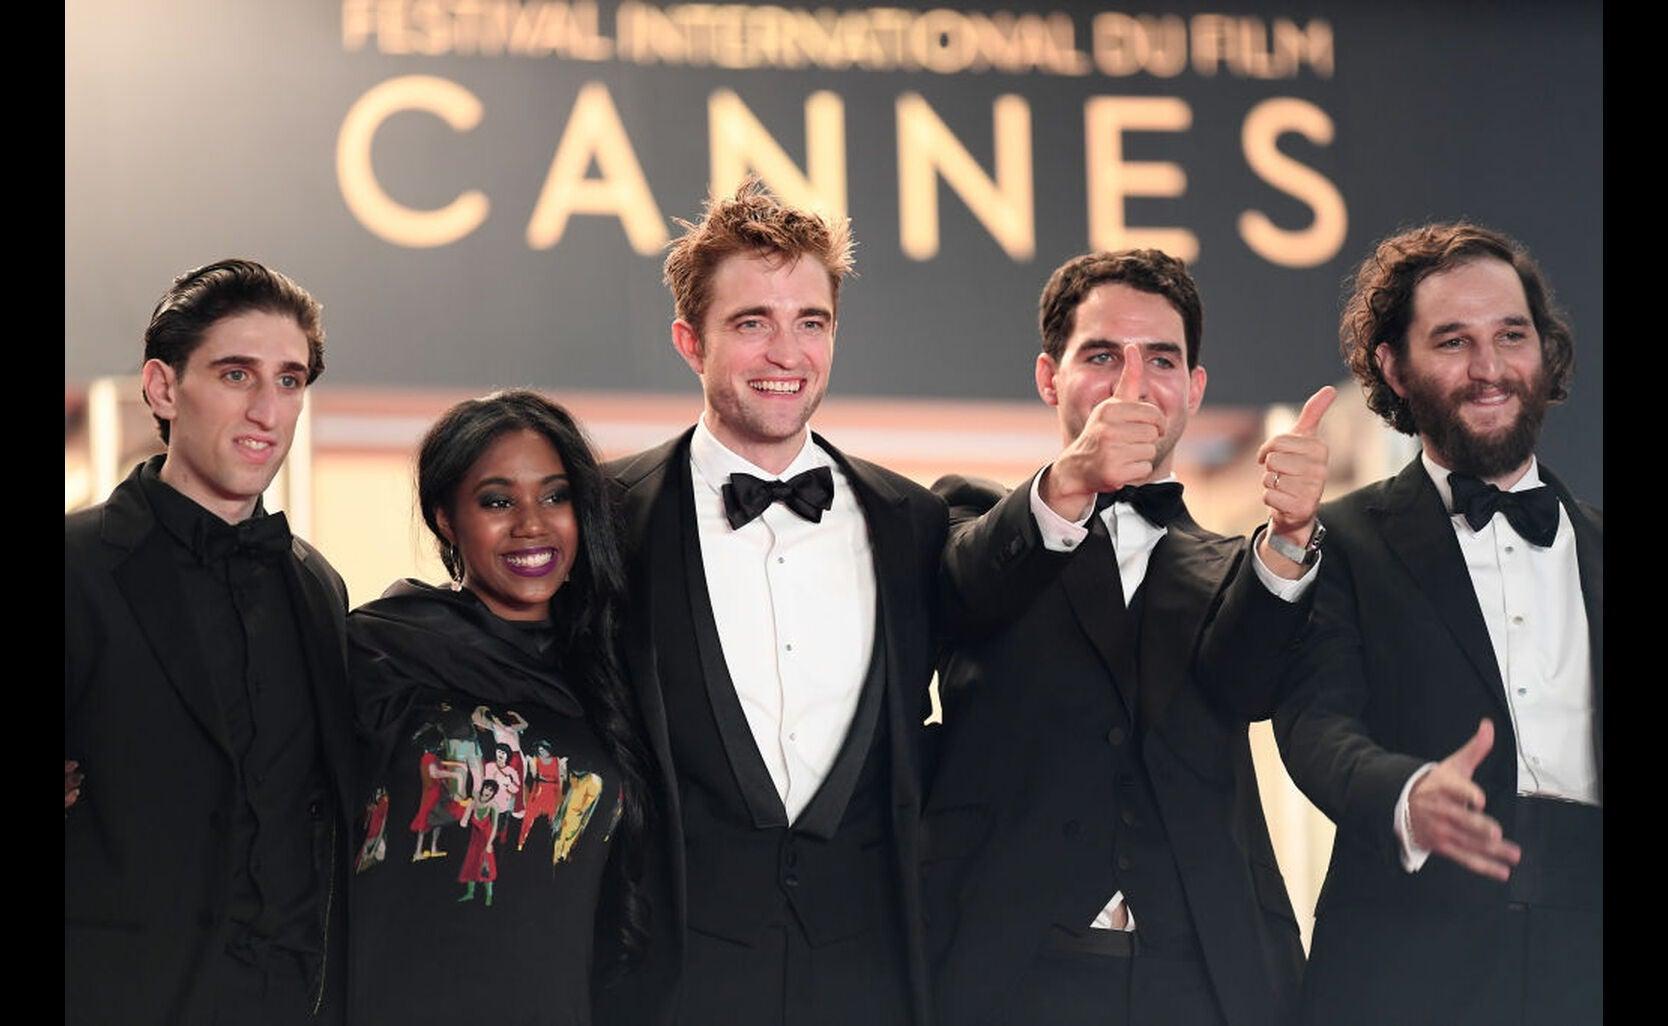 Actor Buddy Duress, actress Taliah Webster, actor Robert Pattinson, writer and co-director Ben Safdie and Co-director Joshua Safdie